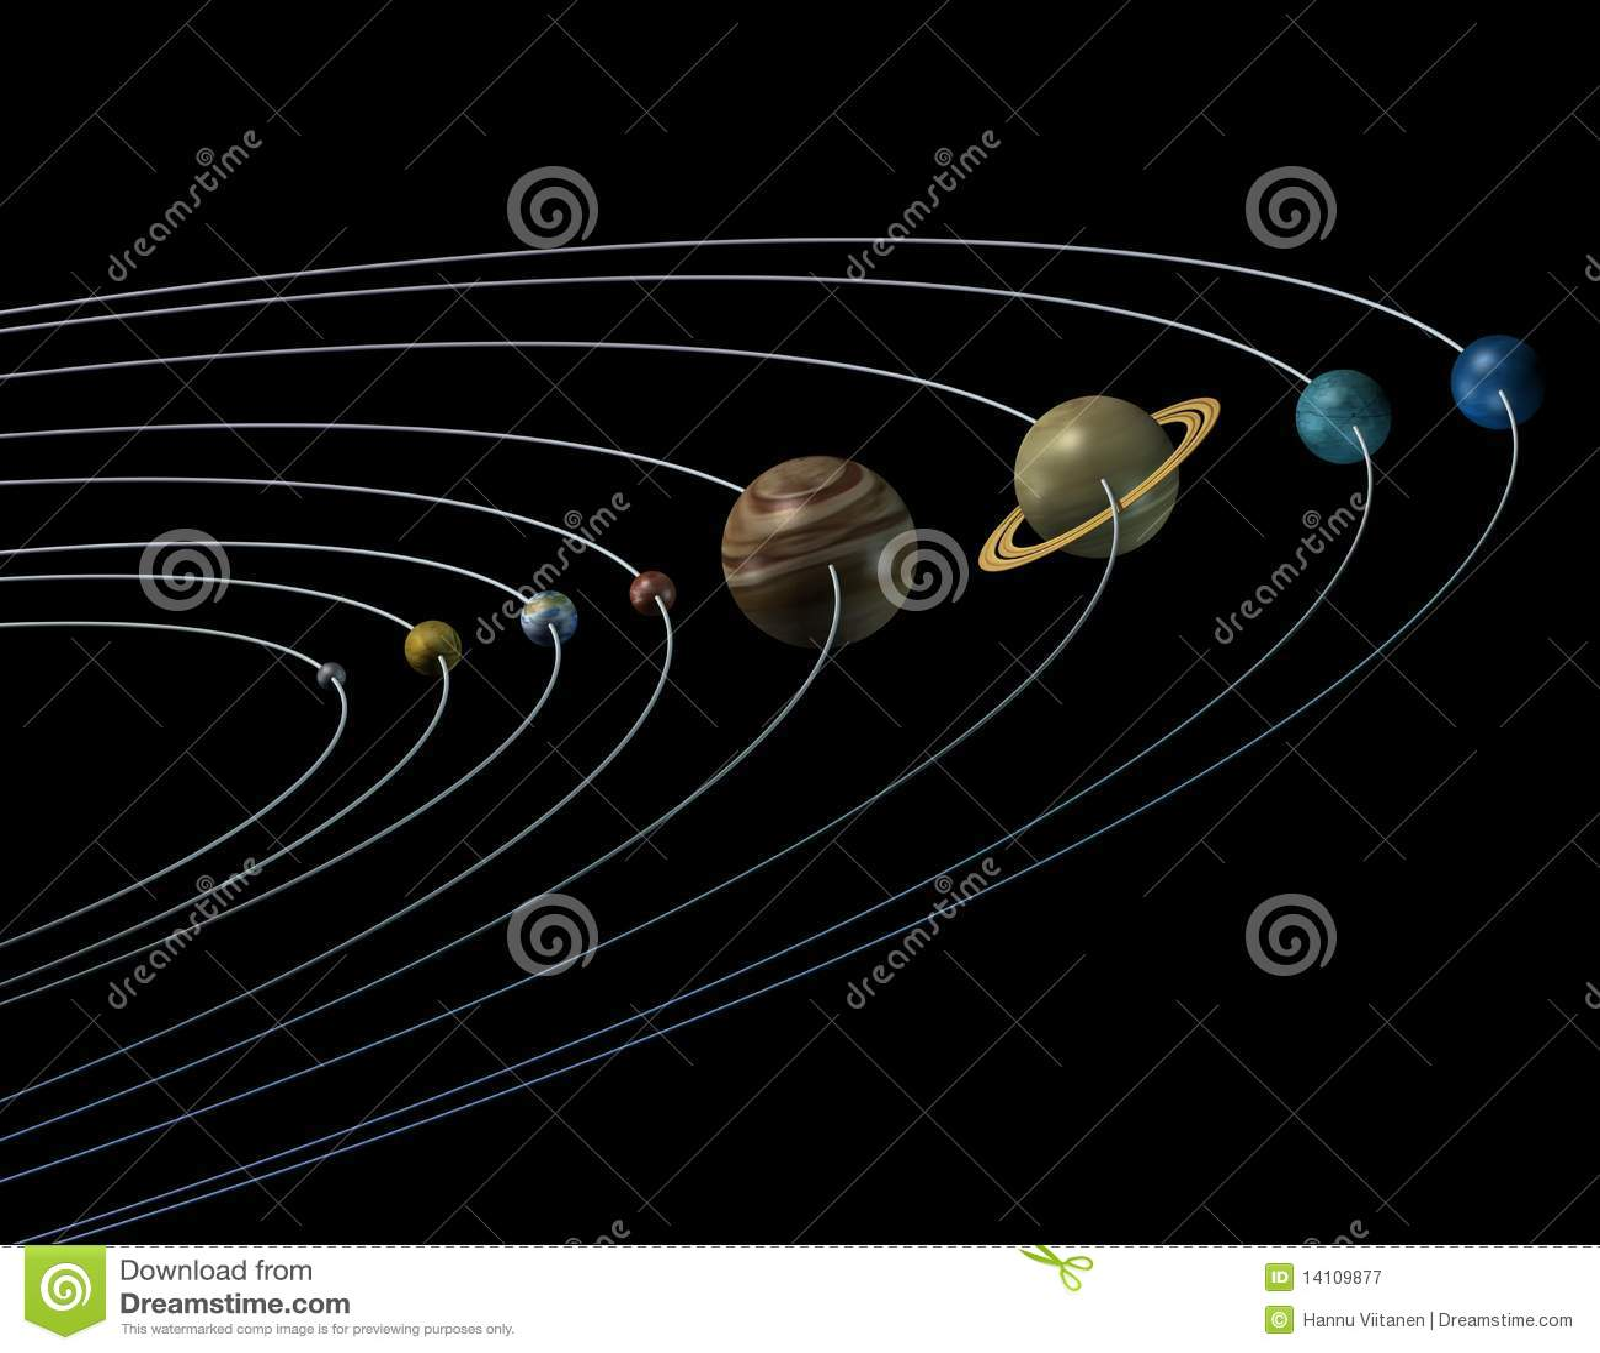 solar system orbits 3d - photo #28